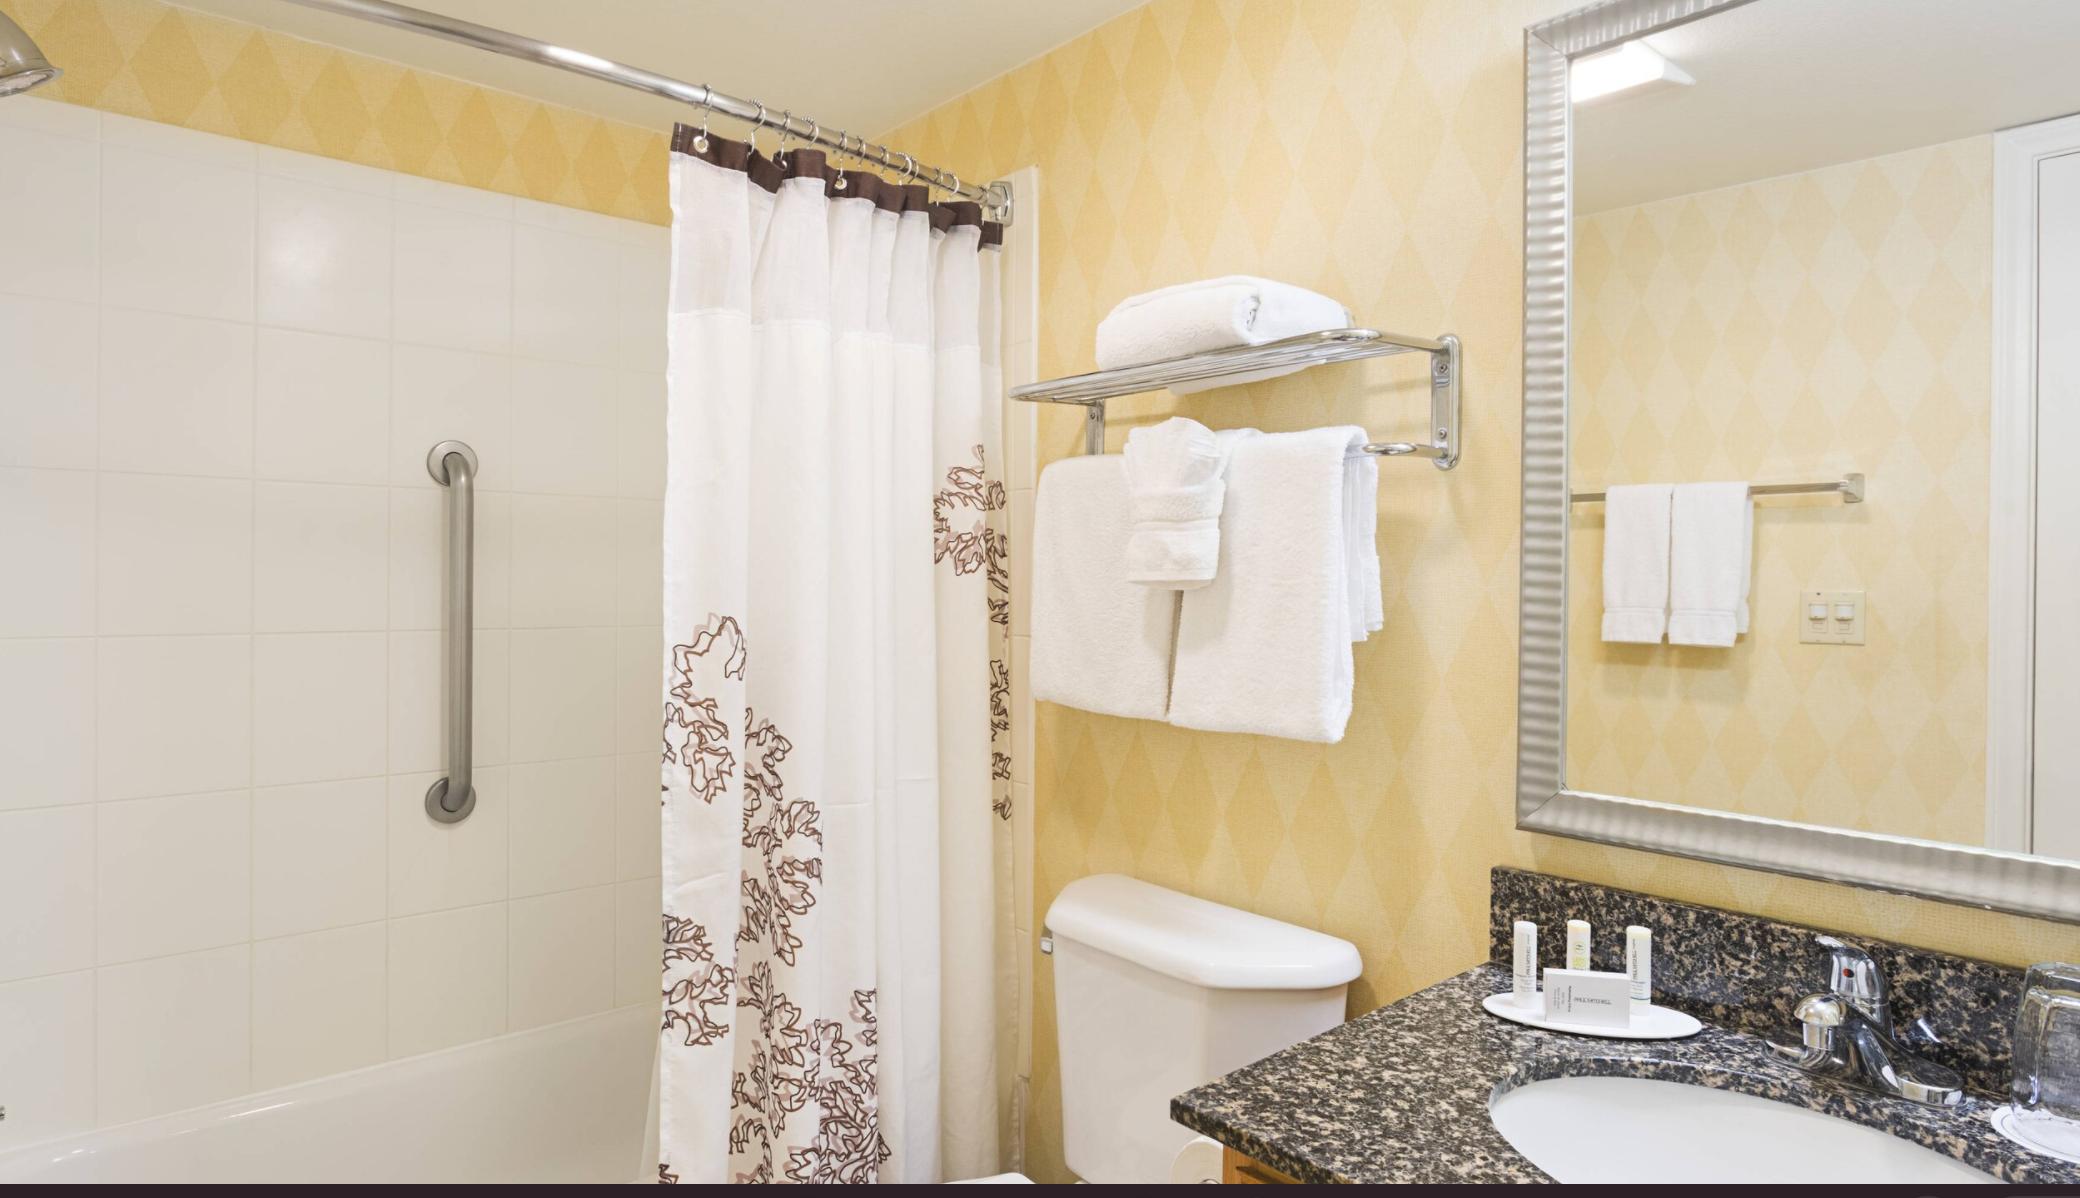 https://www.hotelsbyday.com/_data/default-hotel_image/4/21085/screenshot-2020-08-19-at-6-50-11-pm.png